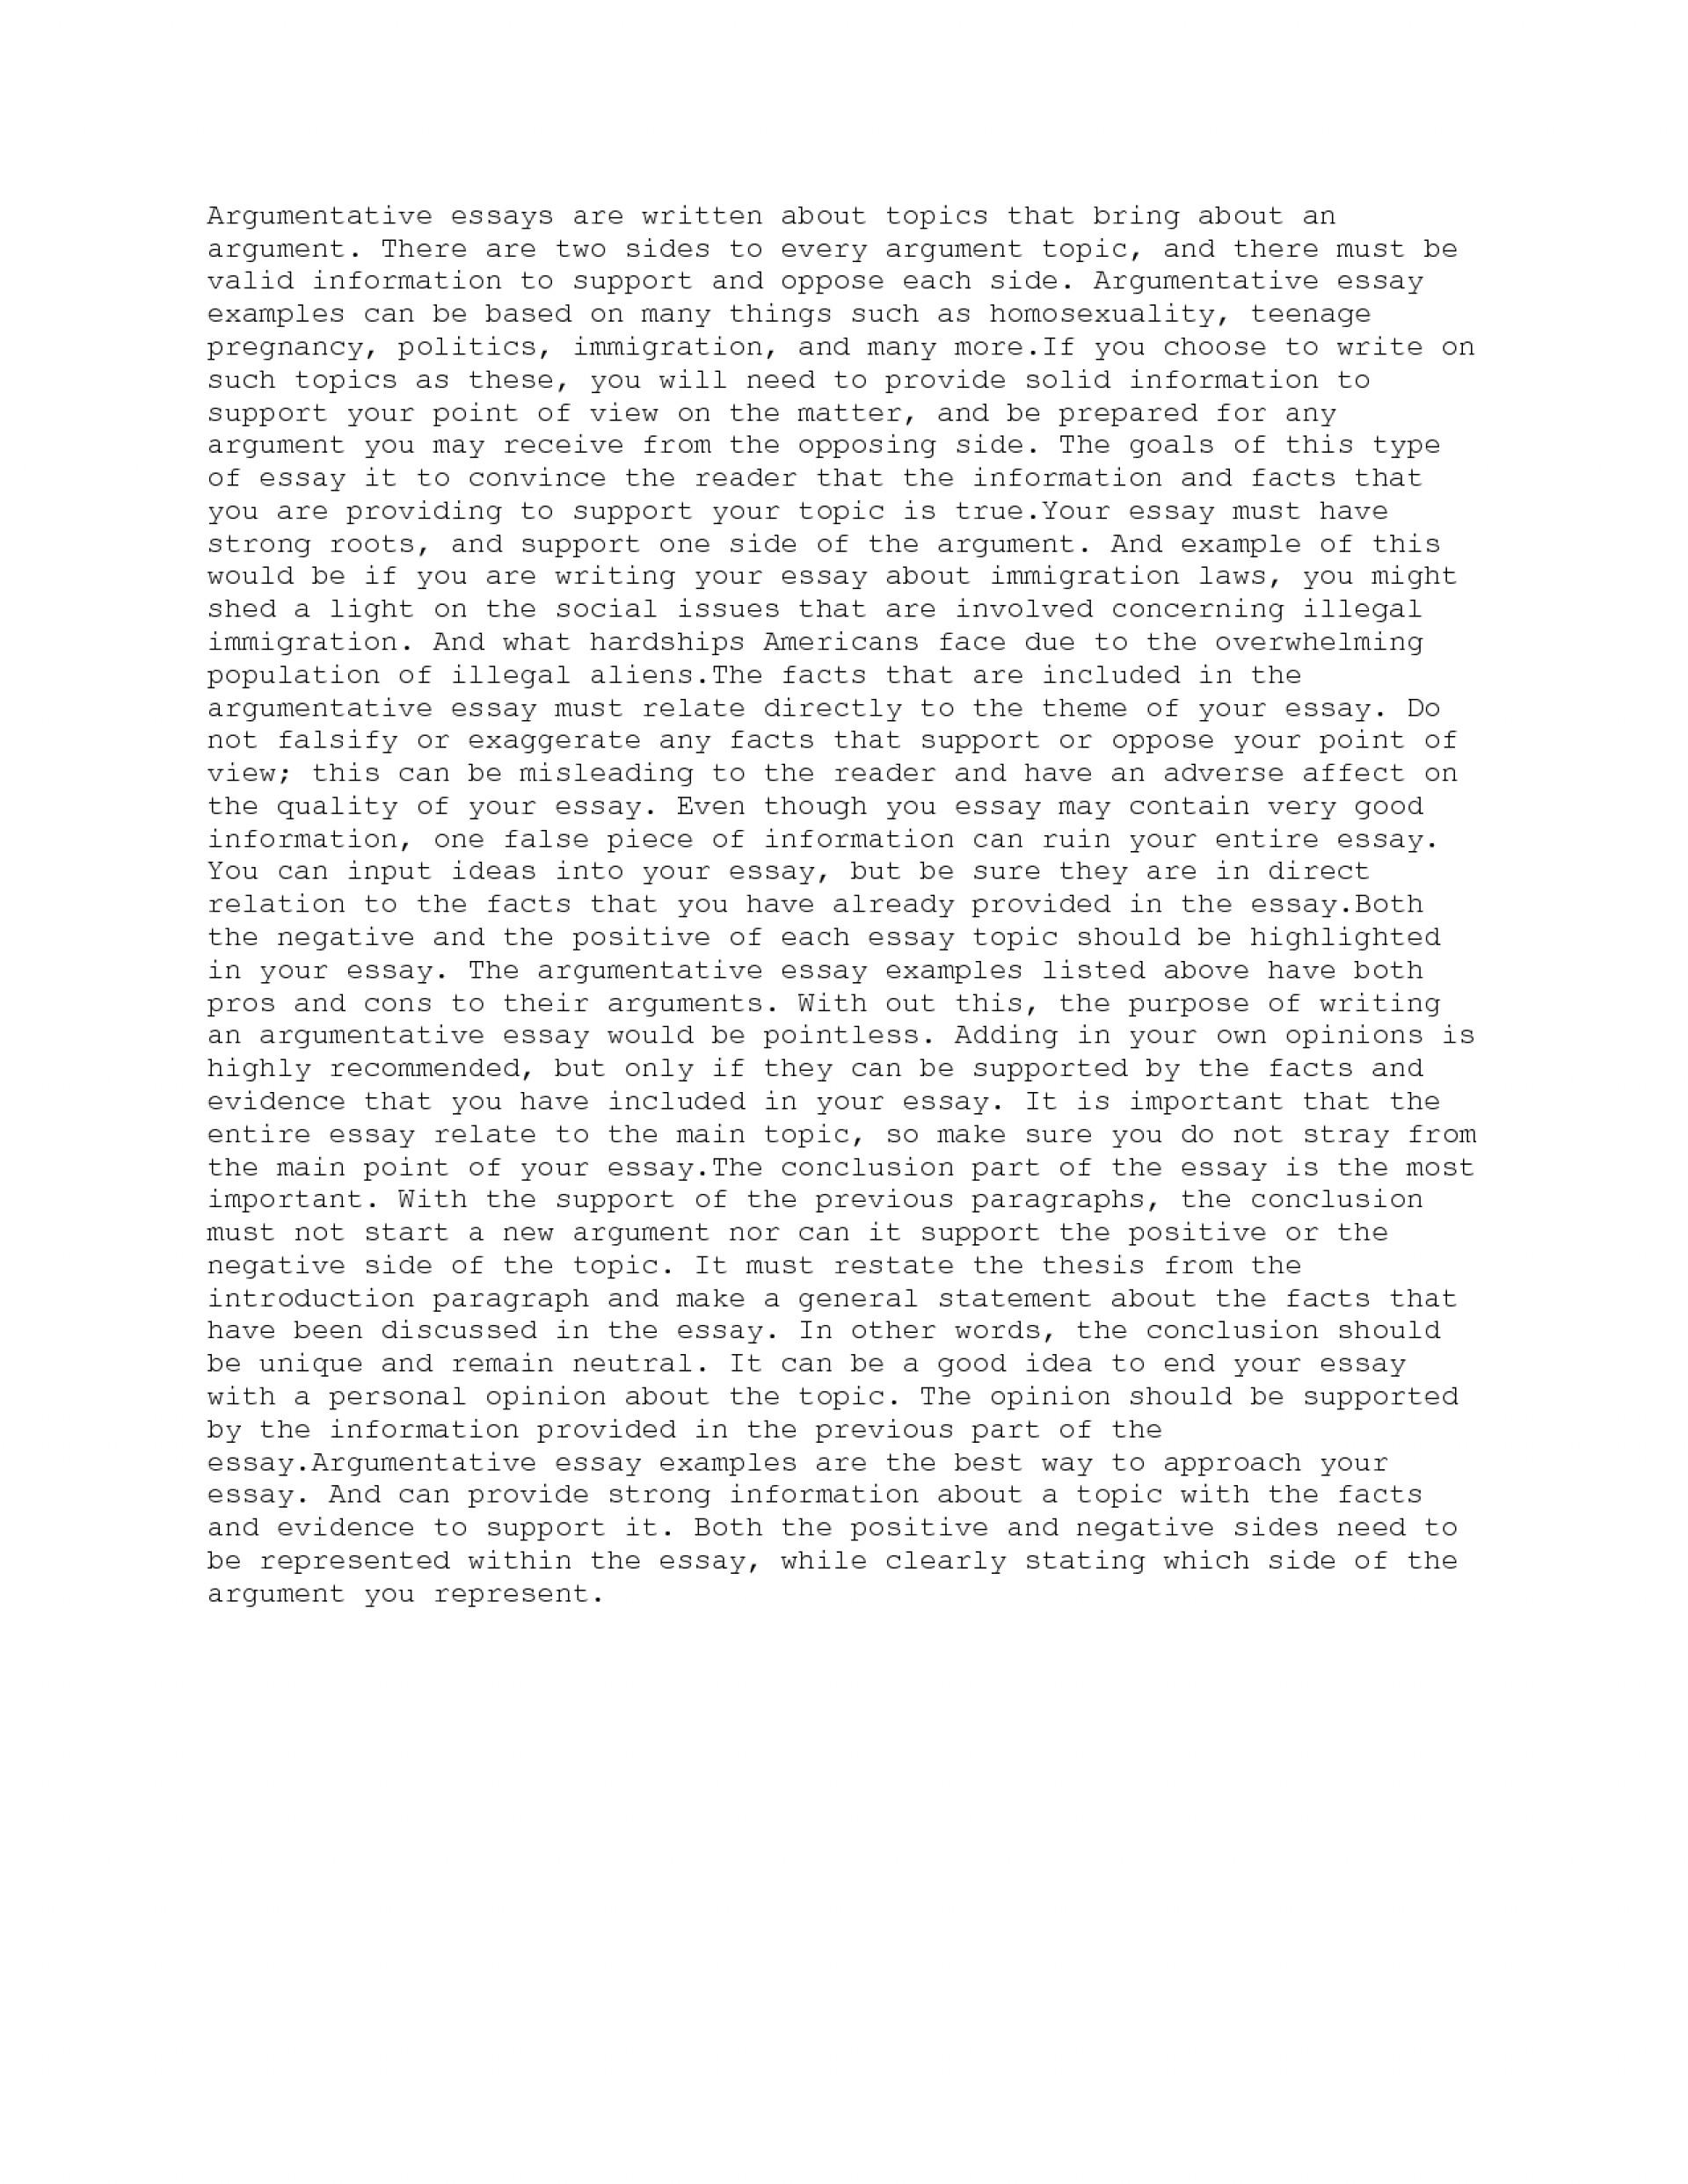 022 Qv3jjq5wkt Best Persuasive Essay Topics Beautiful Uk Argumentative For College 1920